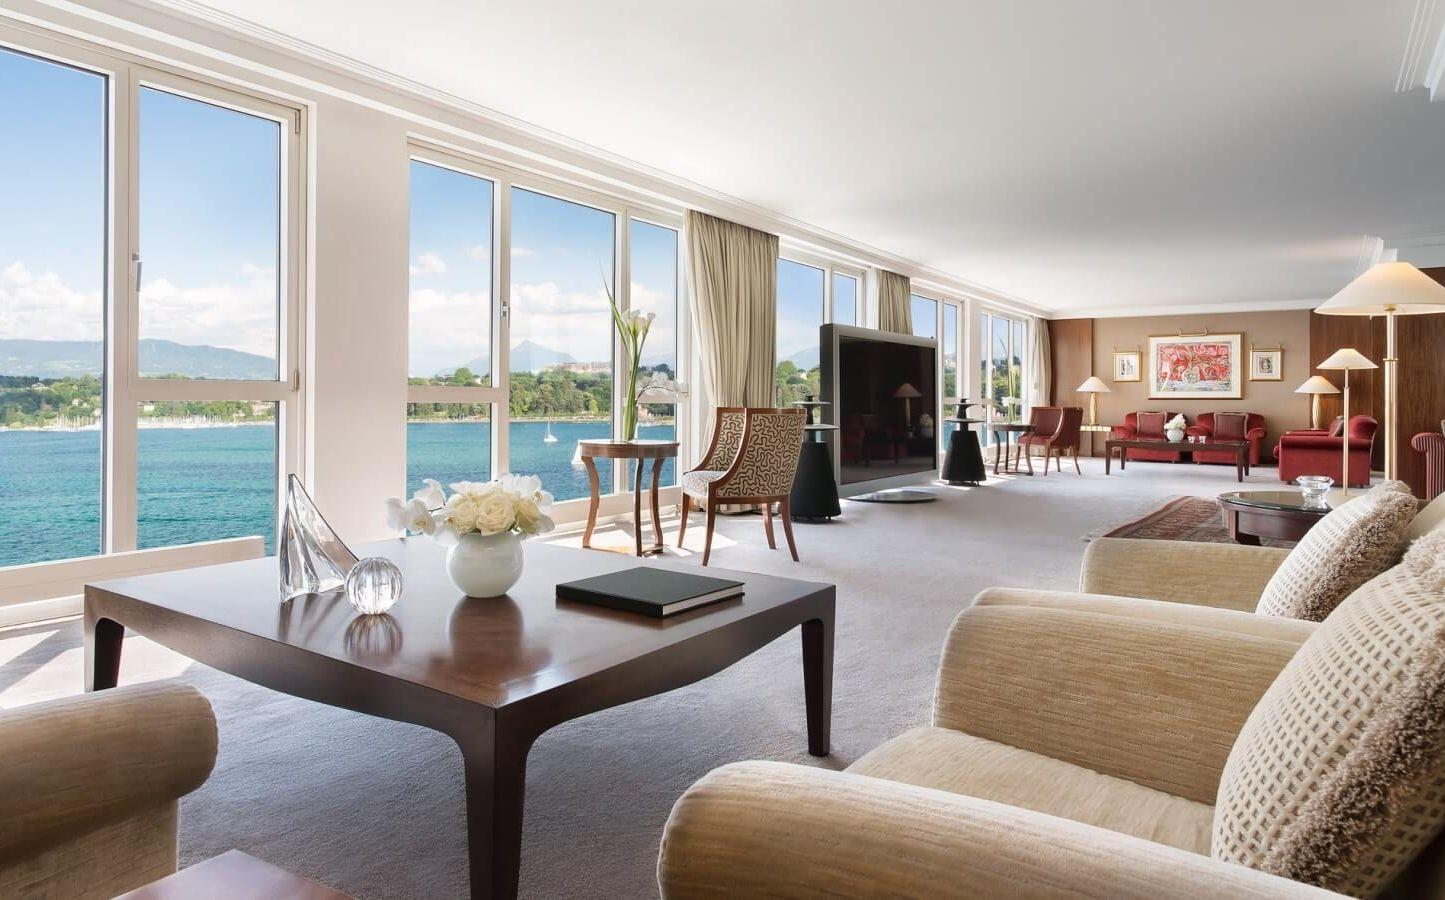 genf hat die teuerste hotel suite der welt die royal penthouse suite. Black Bedroom Furniture Sets. Home Design Ideas